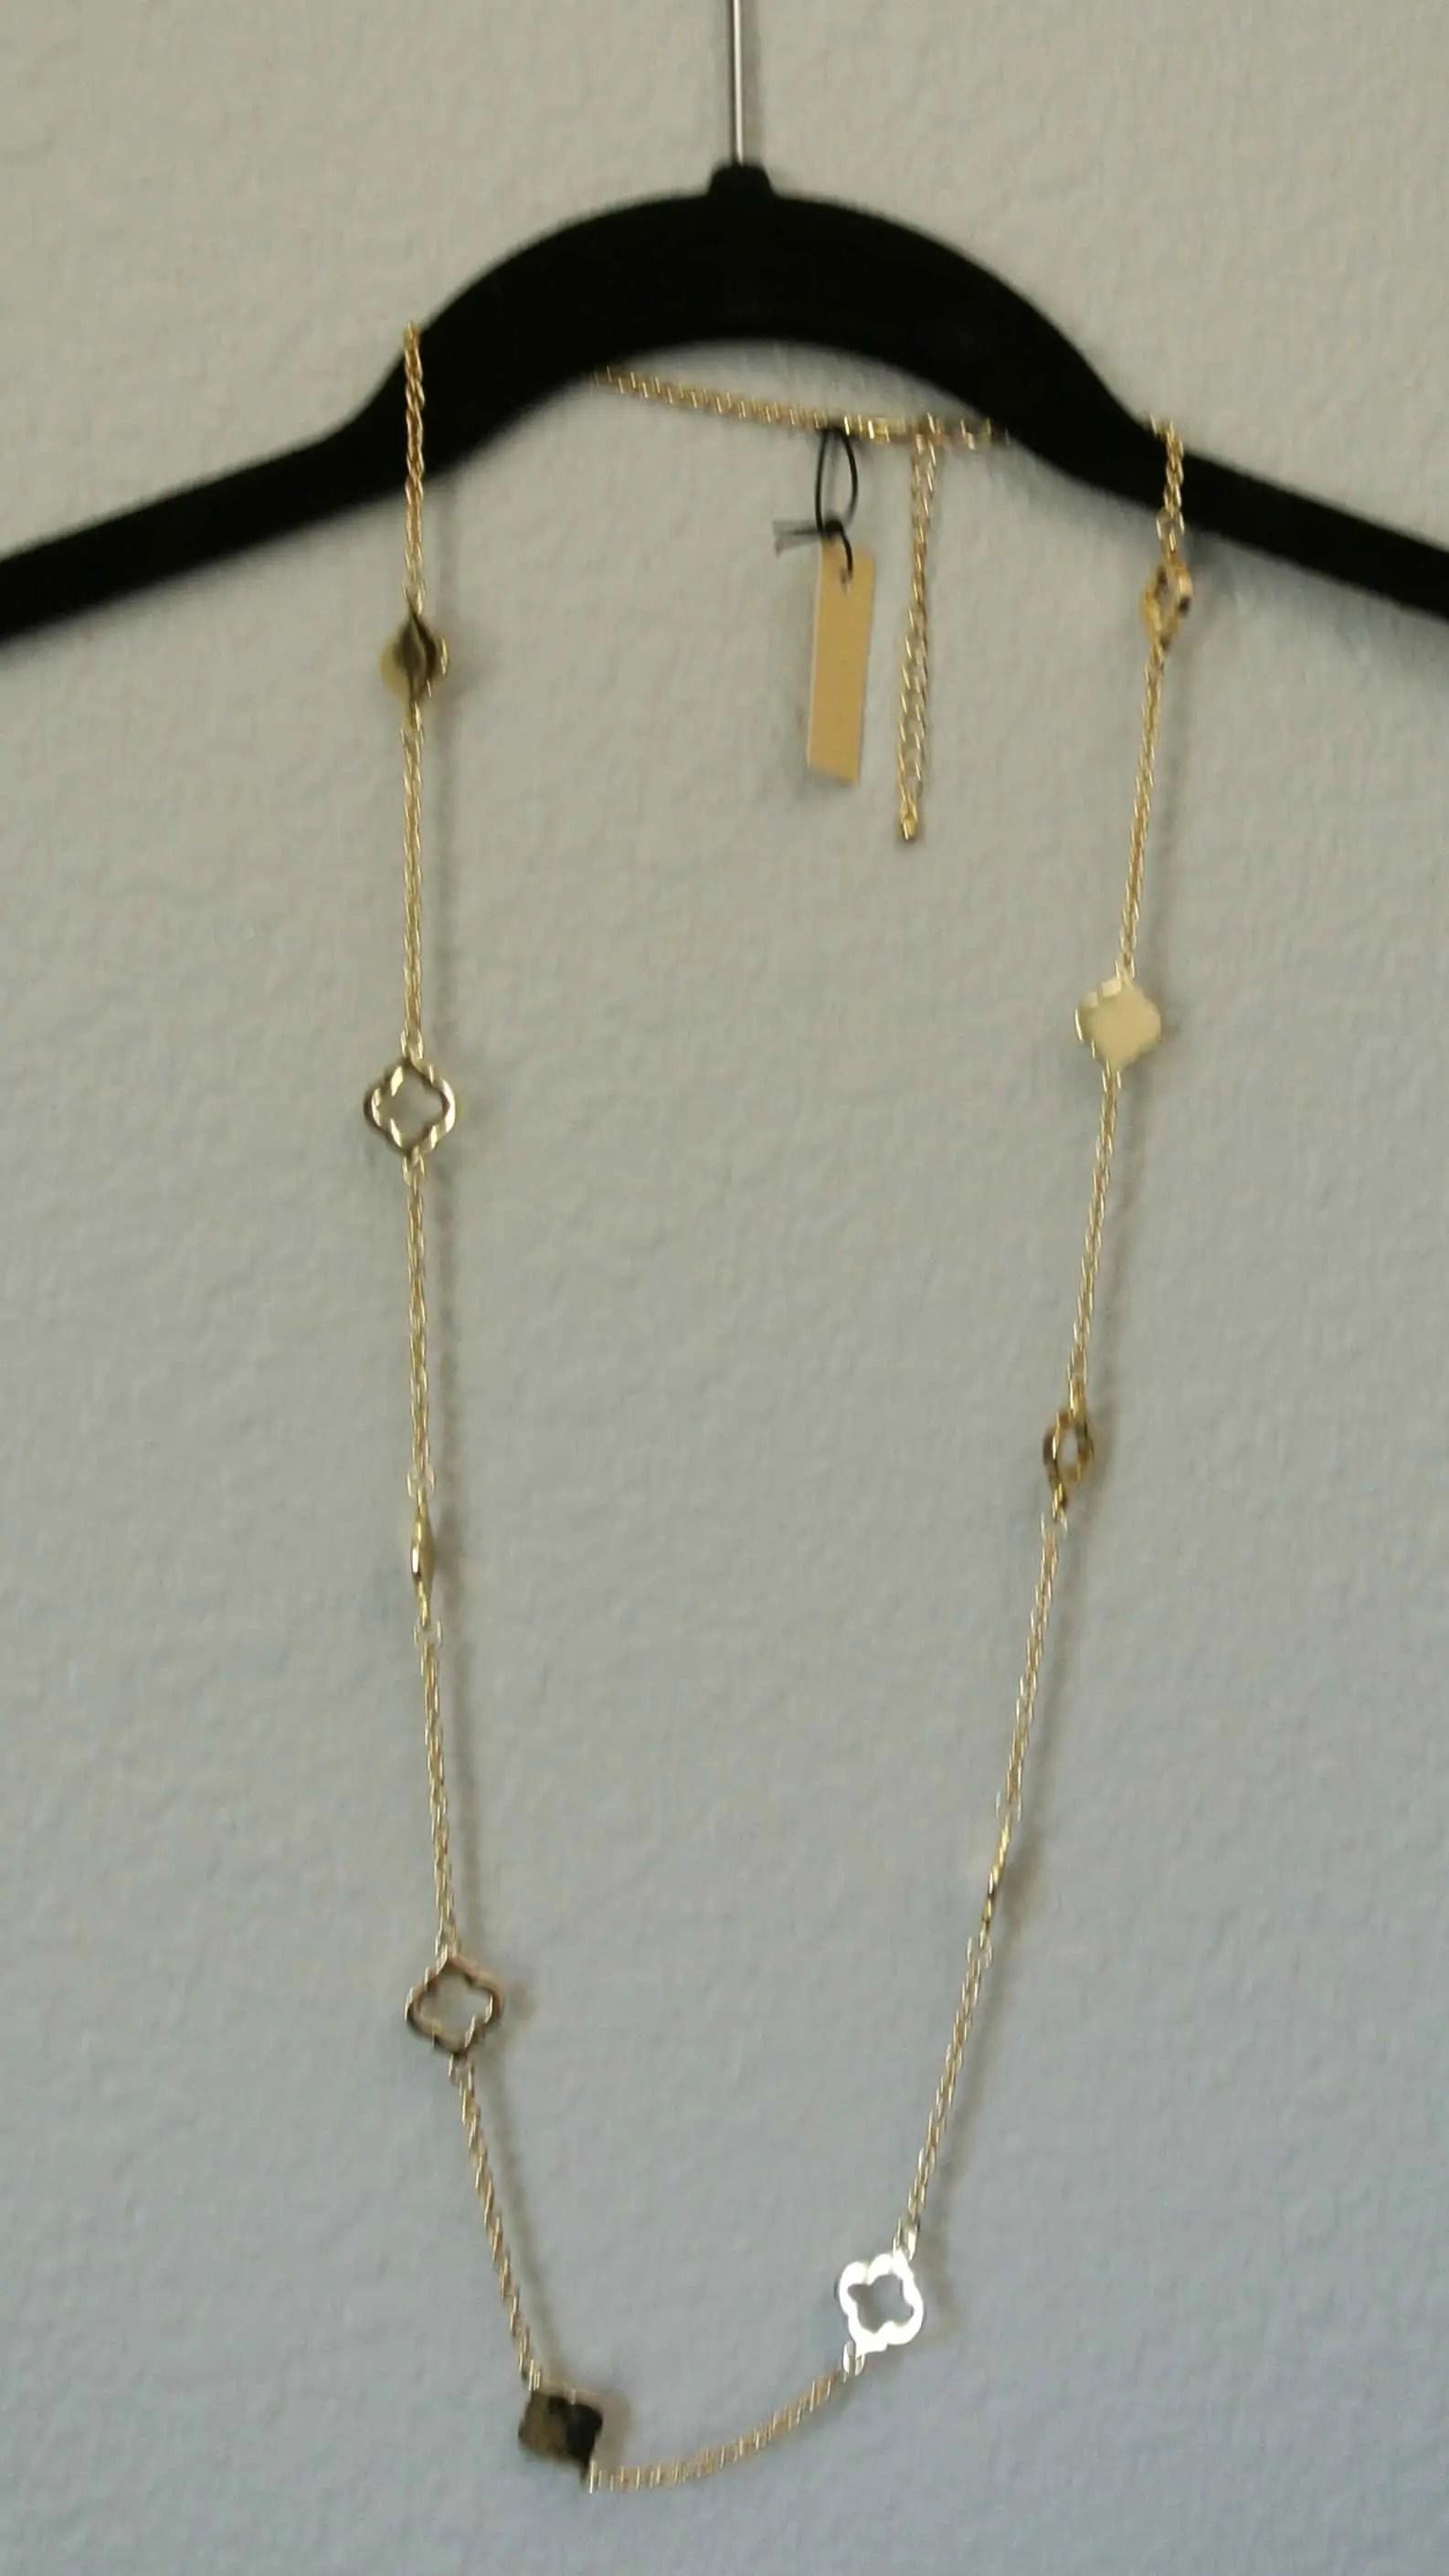 Pixley Kaitlan Spade Necklace